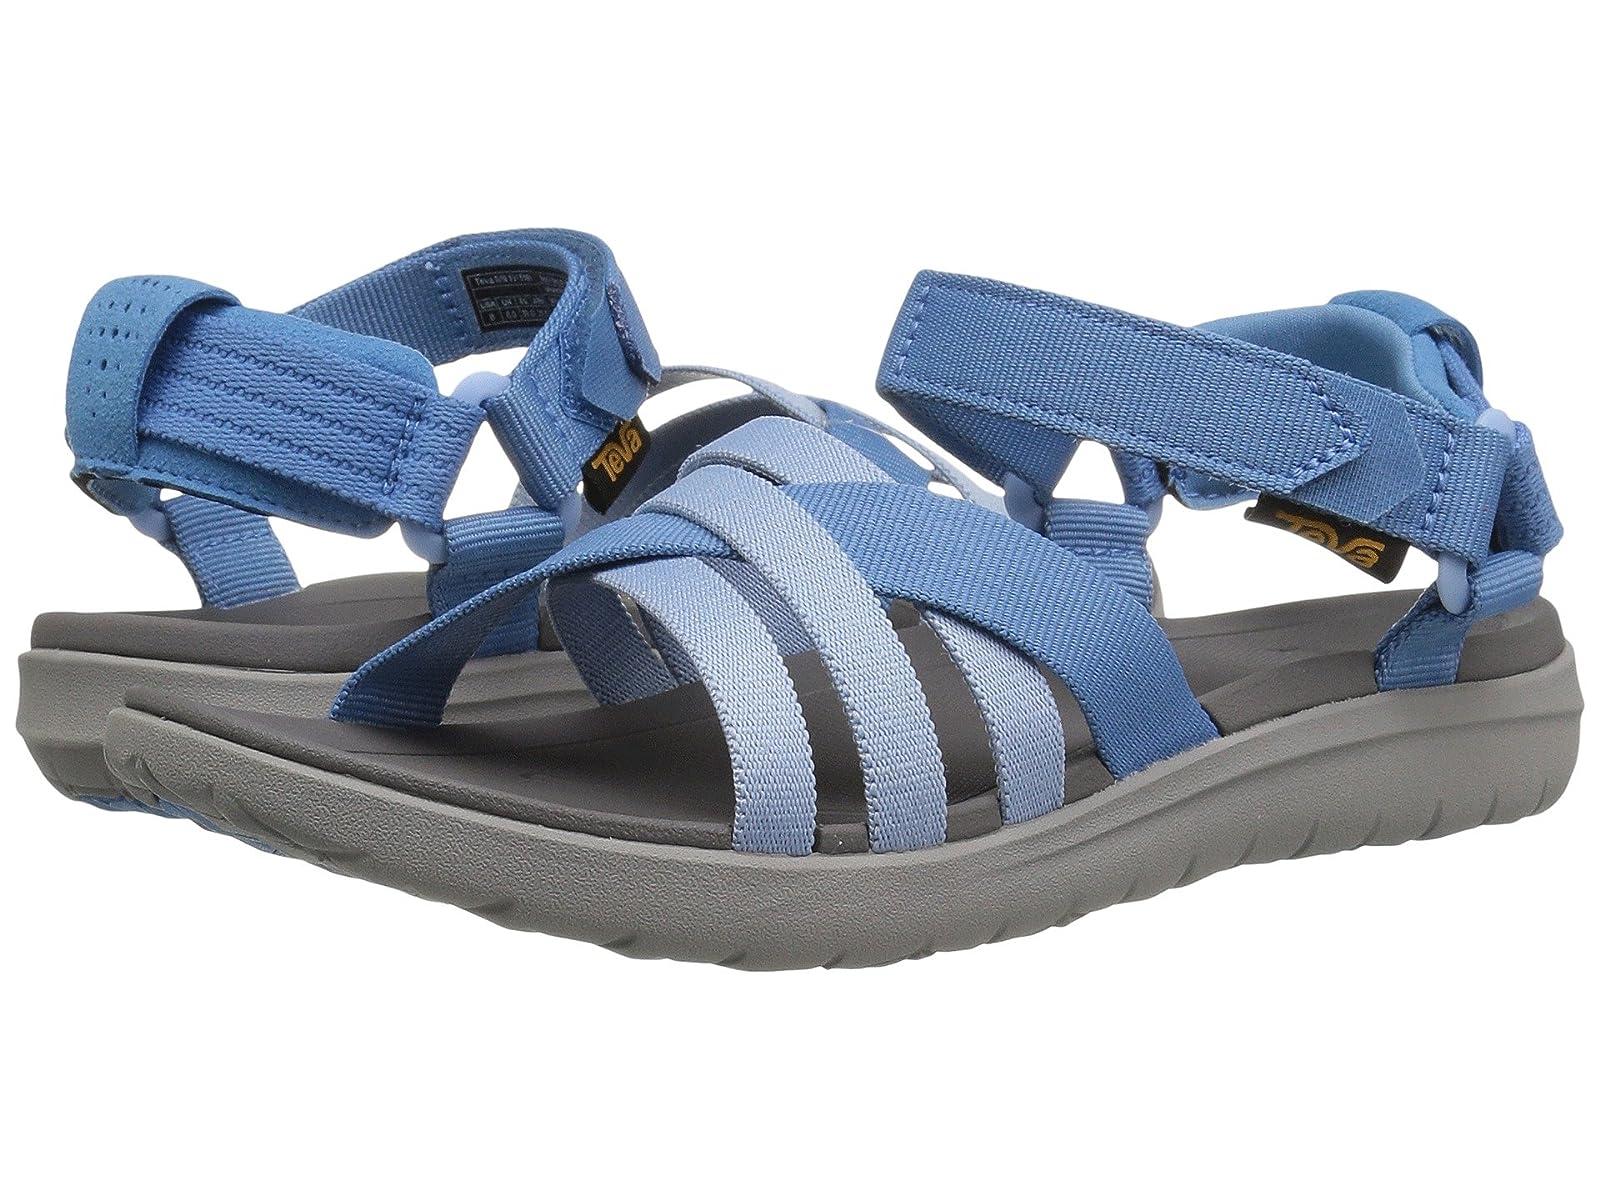 Teva Sanborn SandalCheap and distinctive eye-catching shoes